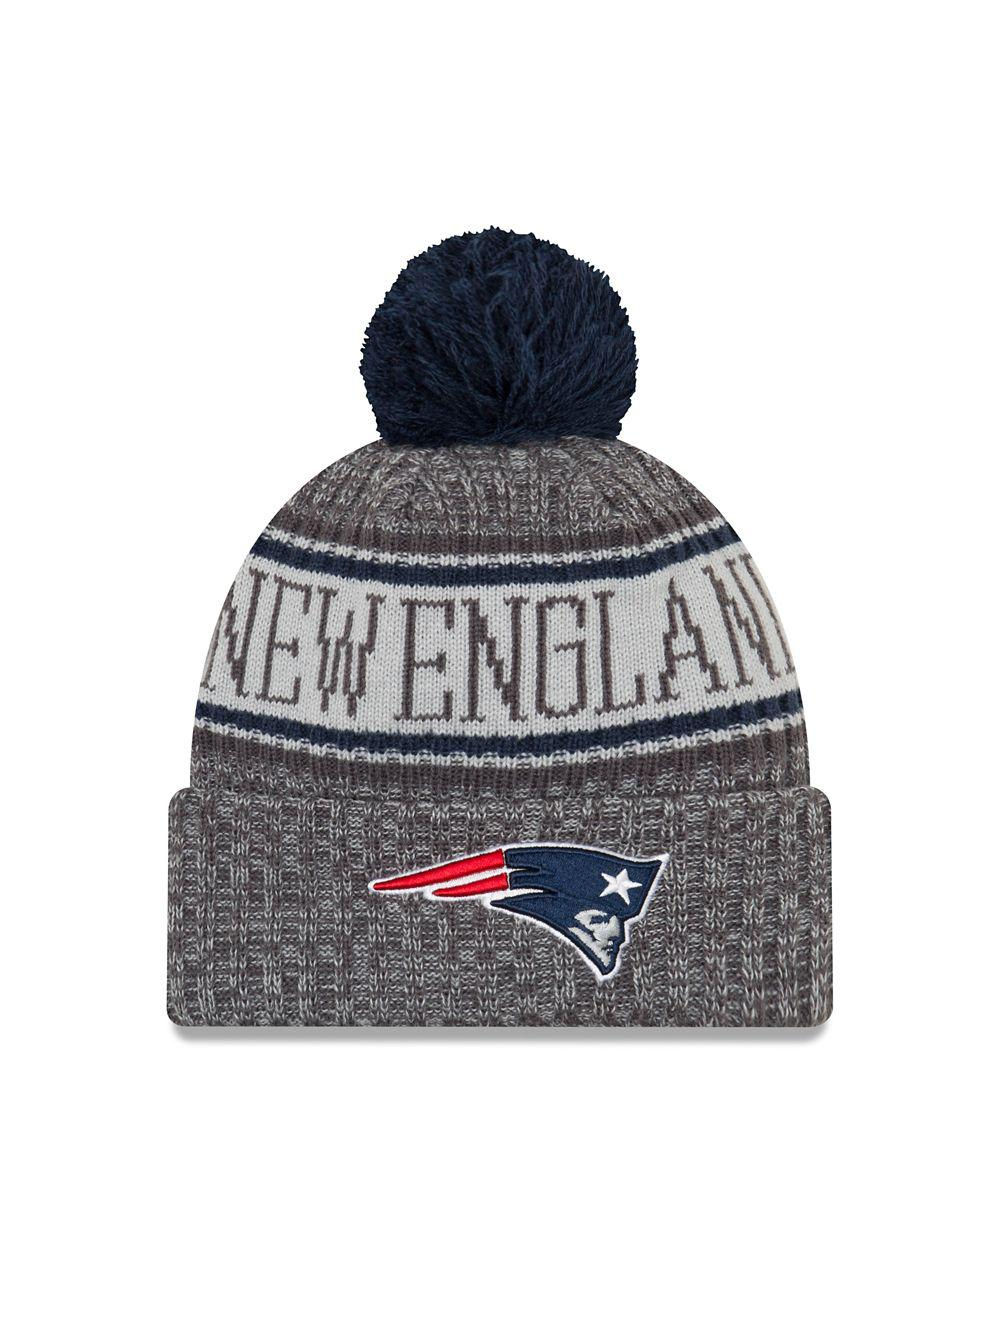 KTZ. Men s Blue Nfl Sideline New England Patriots Cold Weather Sport Knit  Hat acdb8b5e9